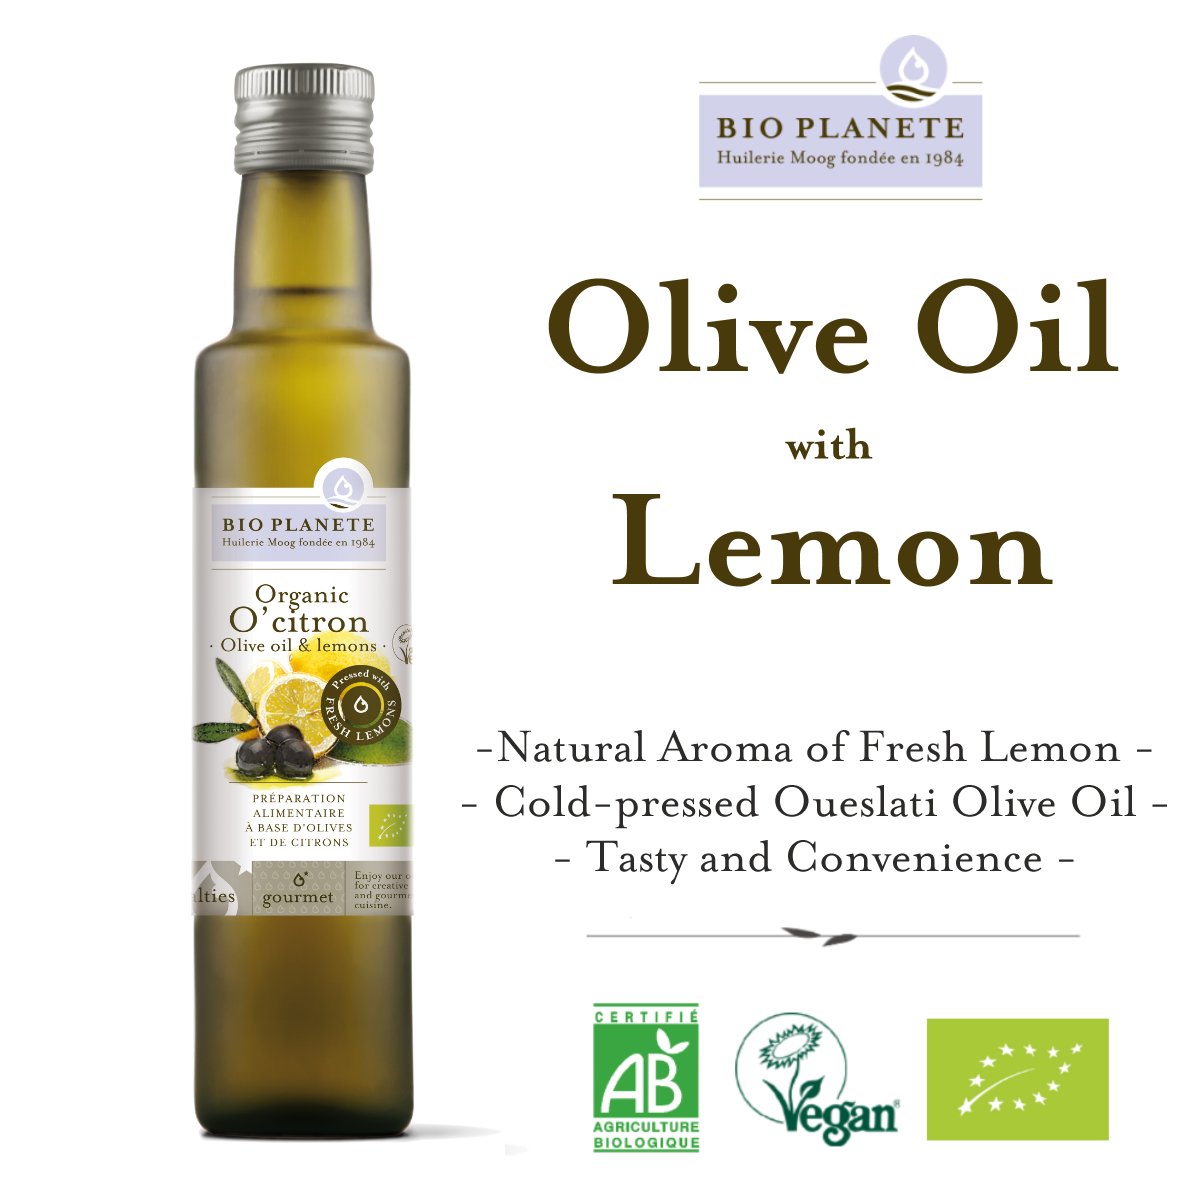 BIO PLANETE Organic Olive Oil with Lemon (250ml) - Organik Minyak Zaitun dengan Limau - 有机柠檬橄榄油 (250毫升)